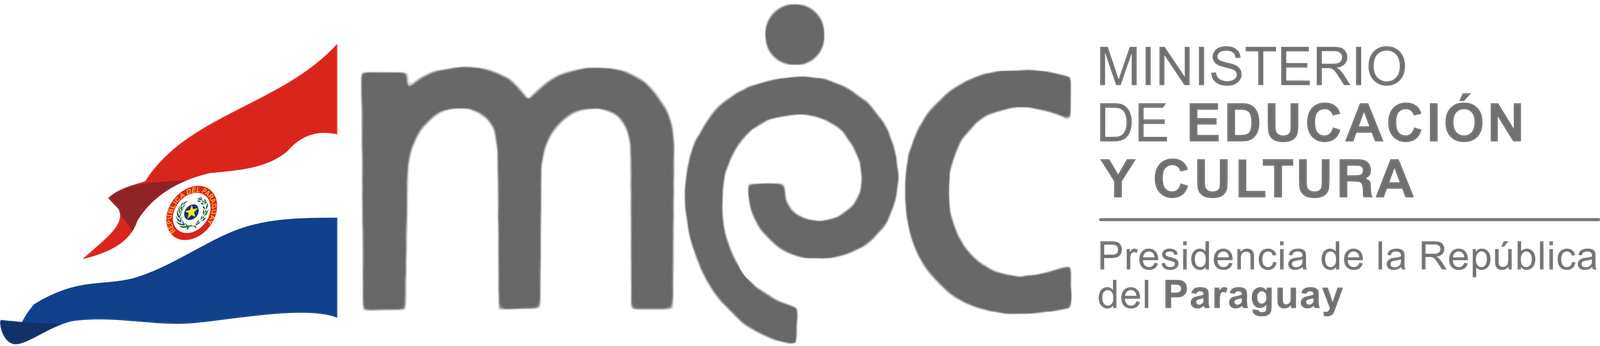 Cantoni blog nuevo logo del mec 2011 for Ministerio de educacion plazas